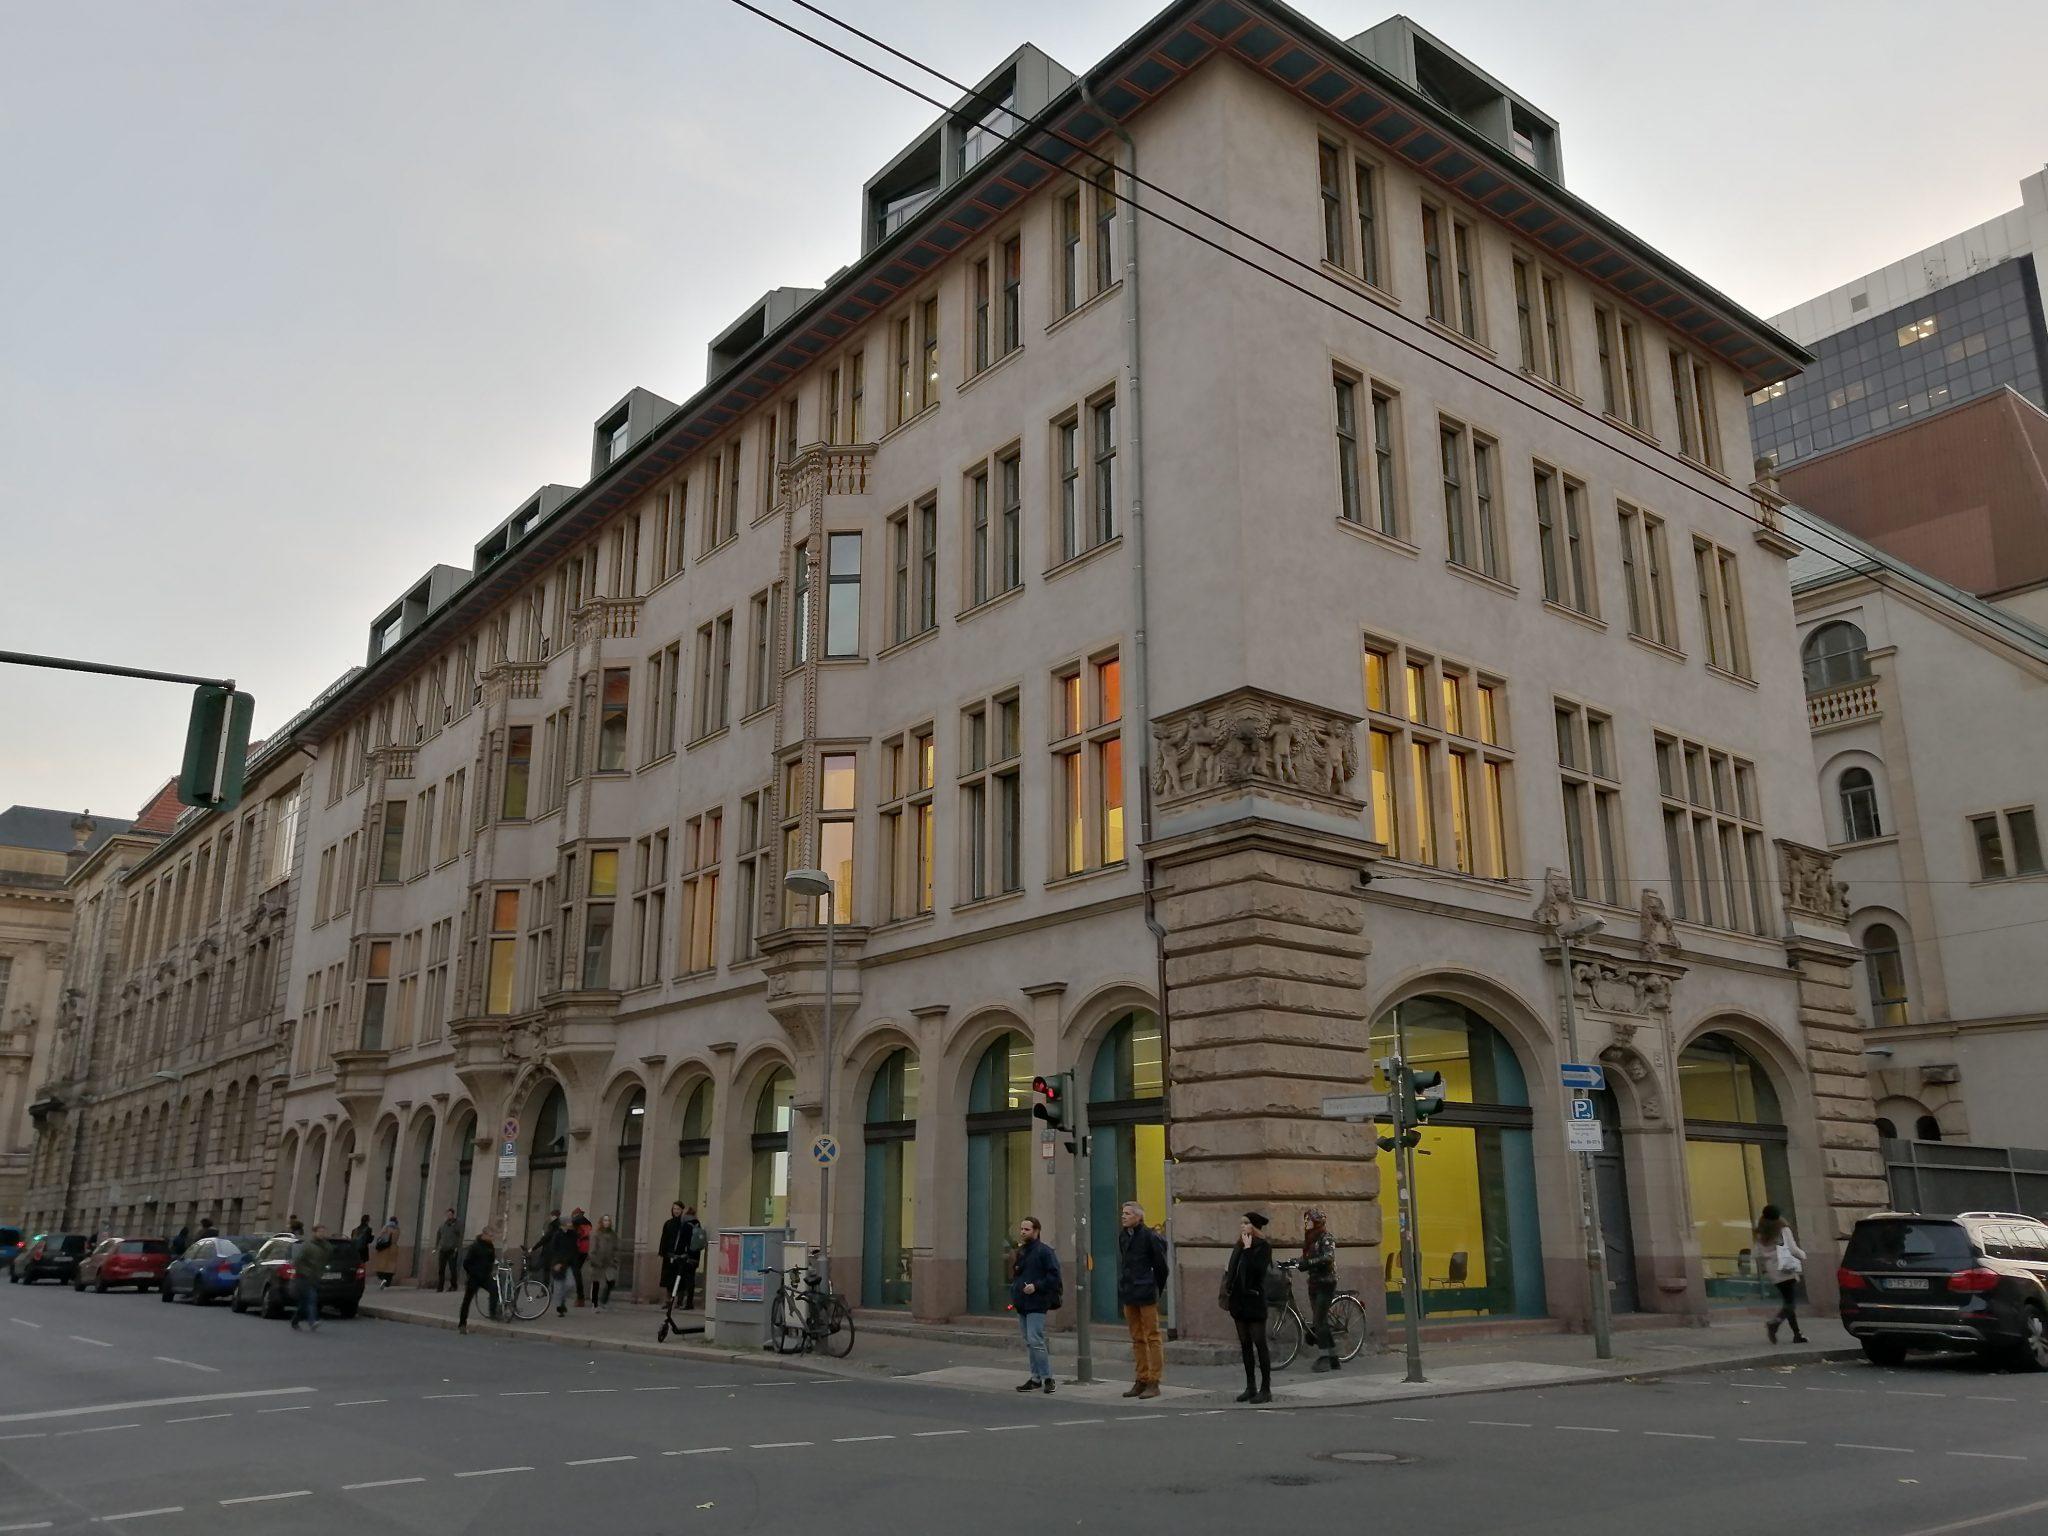 Soziologie Hu Berlin